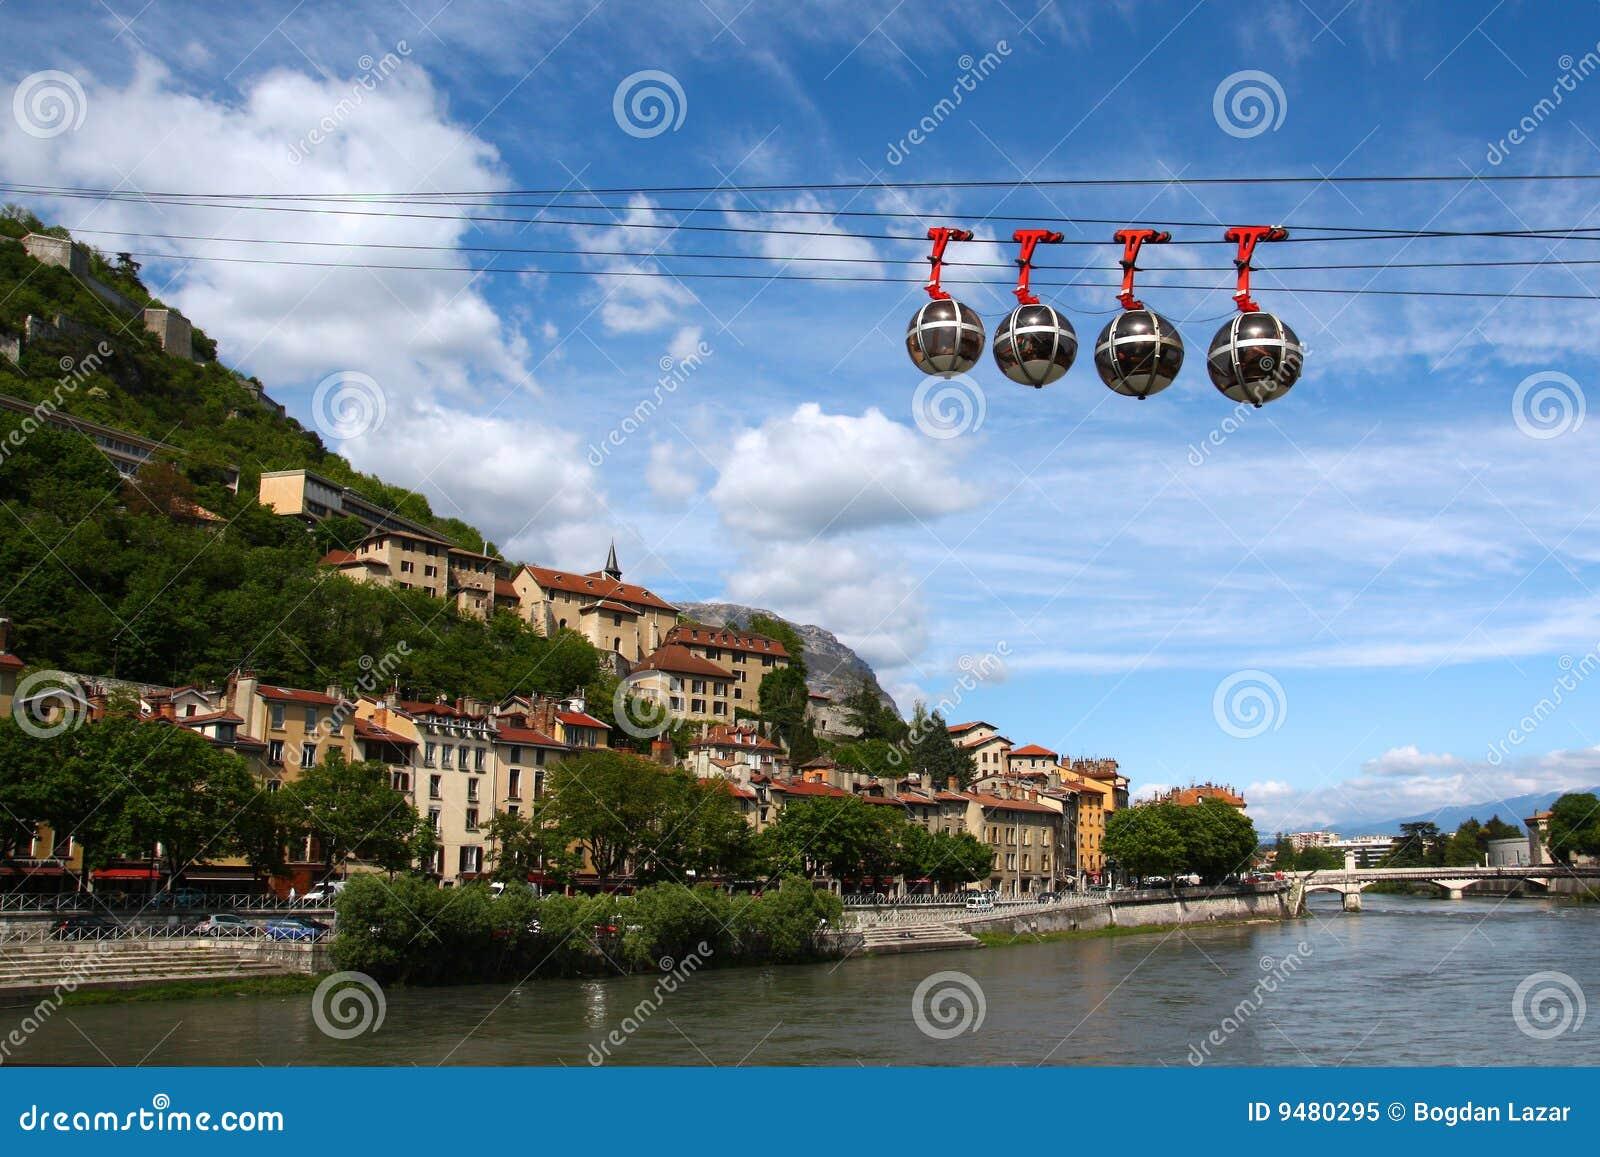 cable car in grenoble france stock image image of spring river 9480295. Black Bedroom Furniture Sets. Home Design Ideas